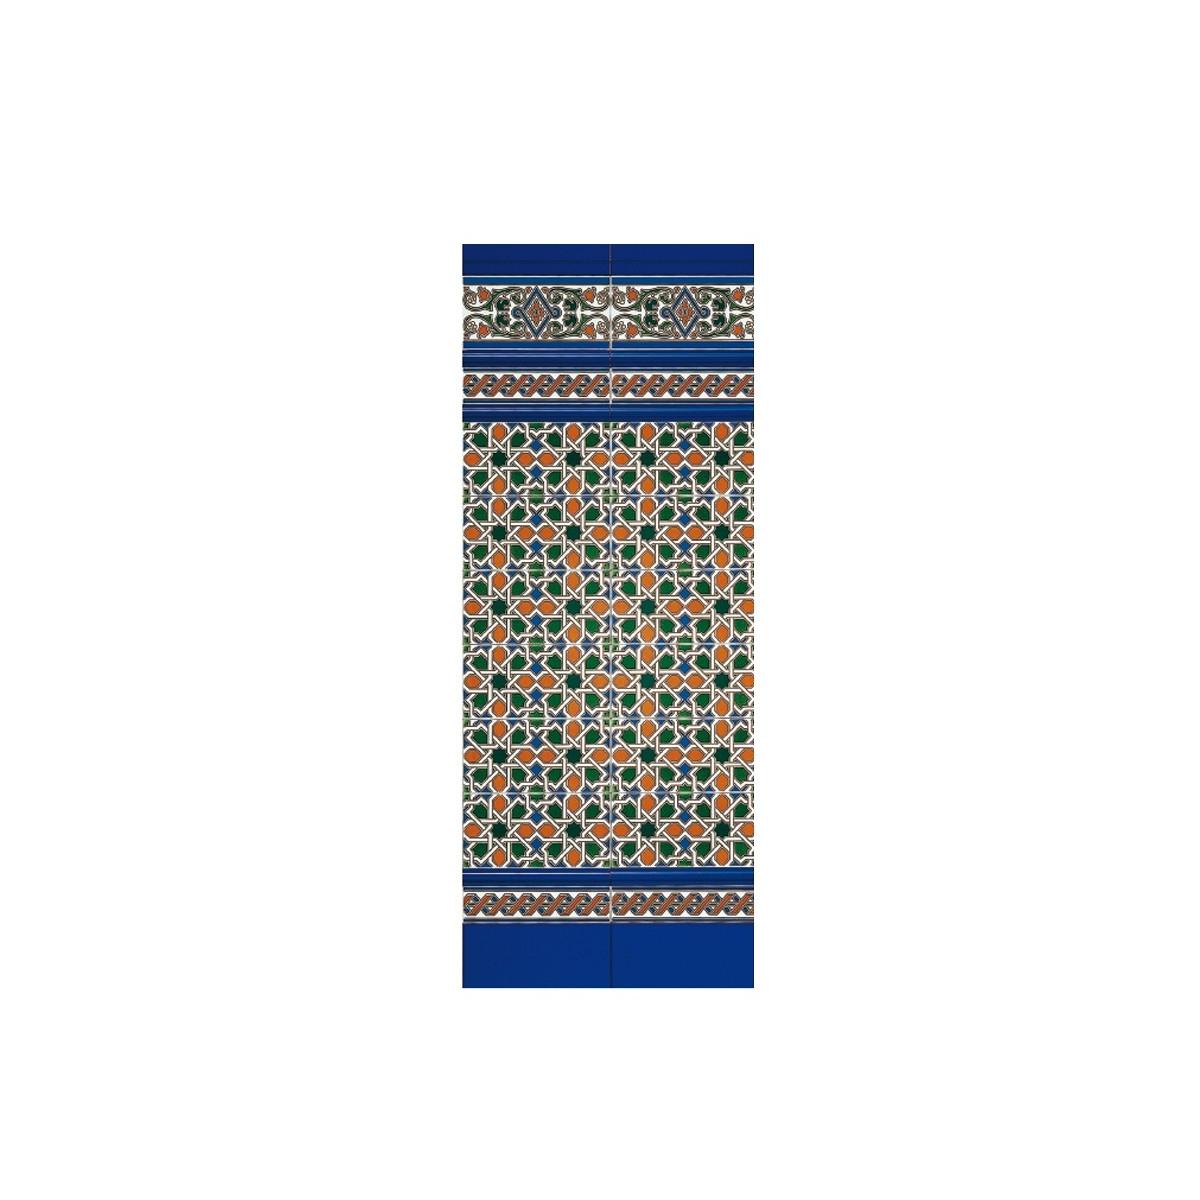 Tira relieve cobalto 3x28 (ud) - Serie Alhambra - Marca Mainzu